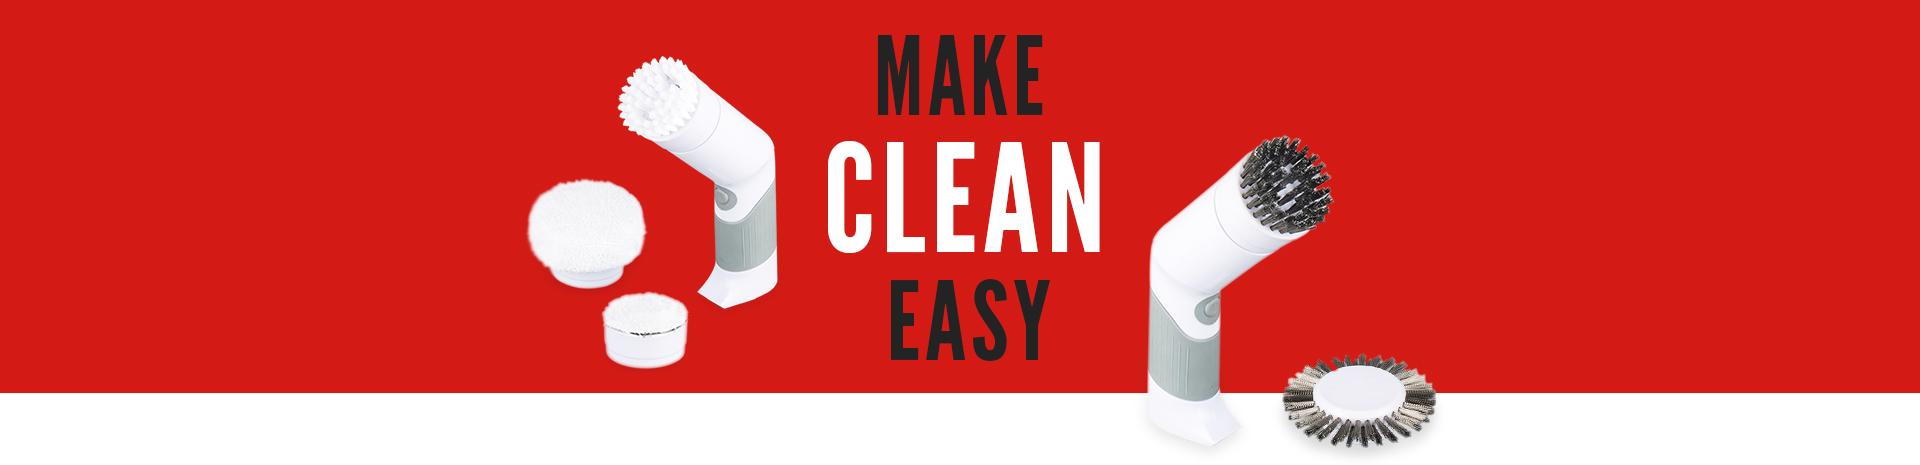 household appliances- emergency lighting- spin scrubber brush-Yilida